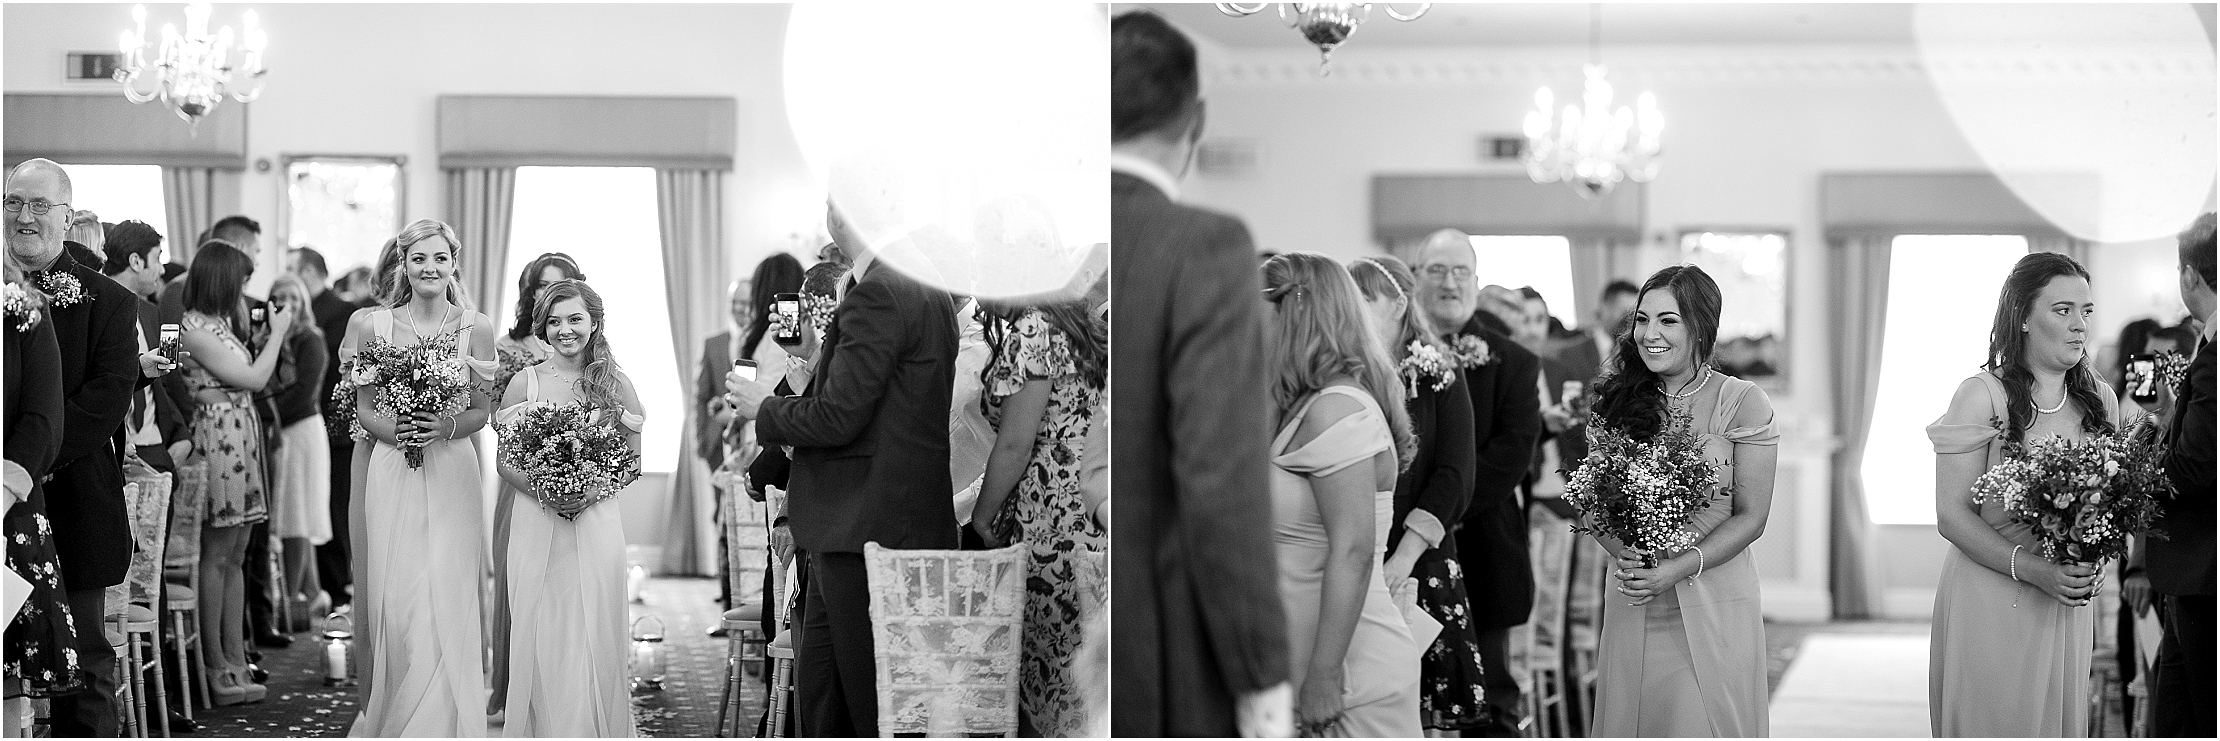 farington-lodge-wedding-29.jpg